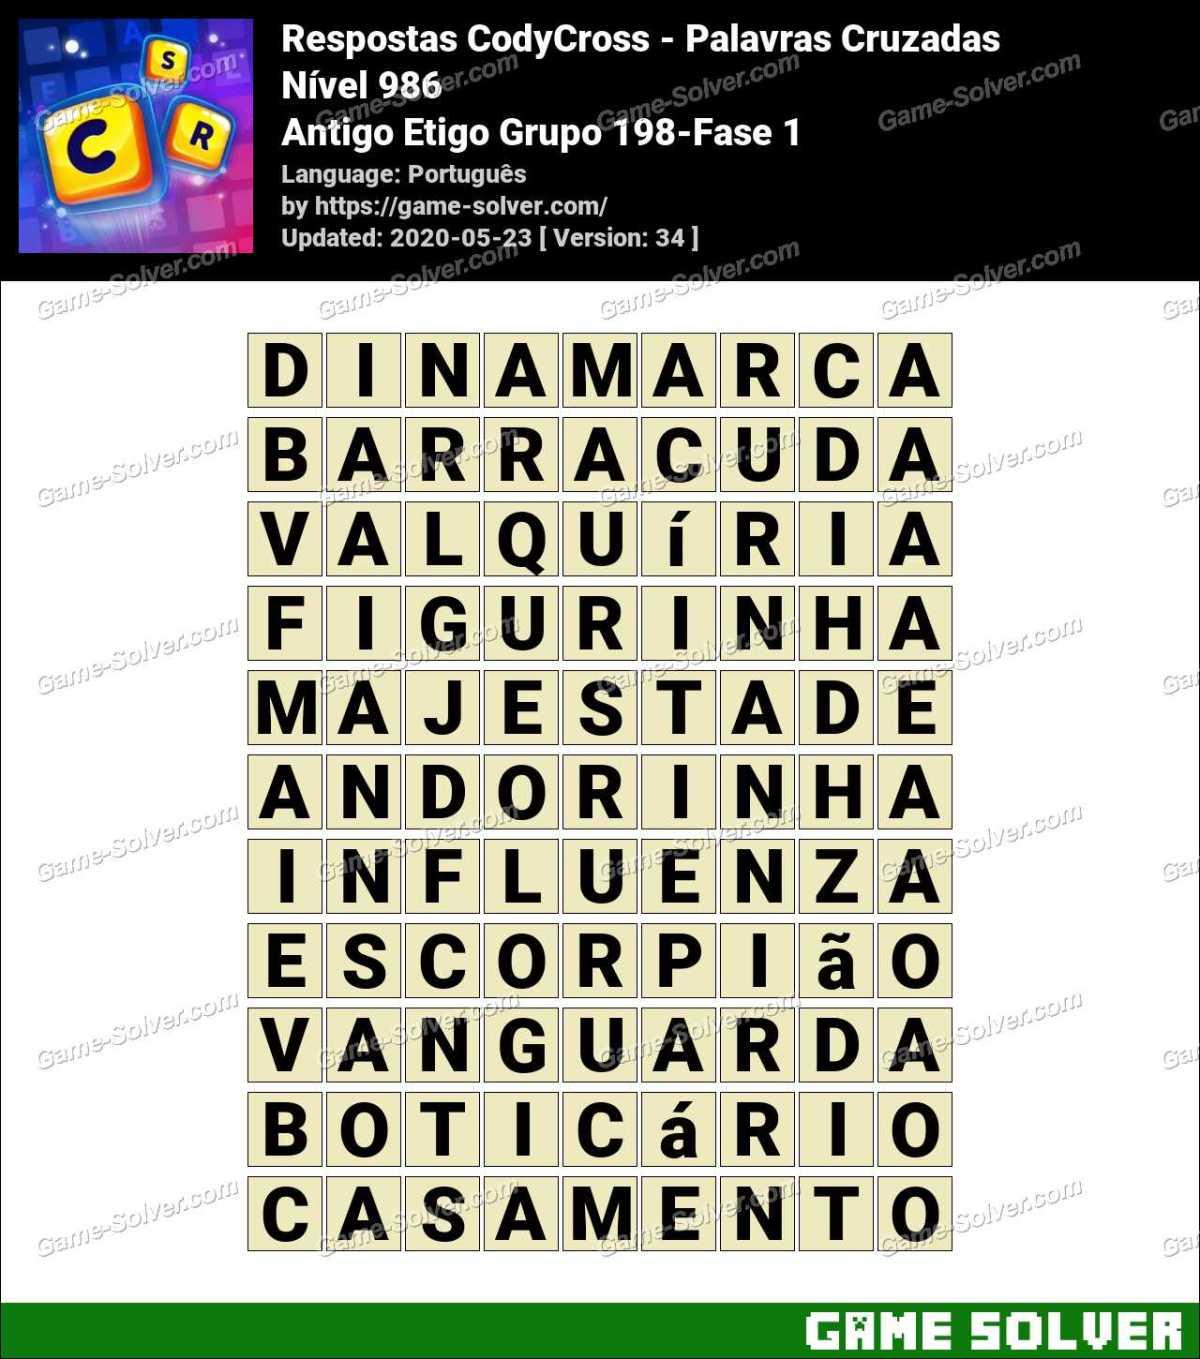 Respostas CodyCross Antigo Etigo Grupo 198-Fase 1